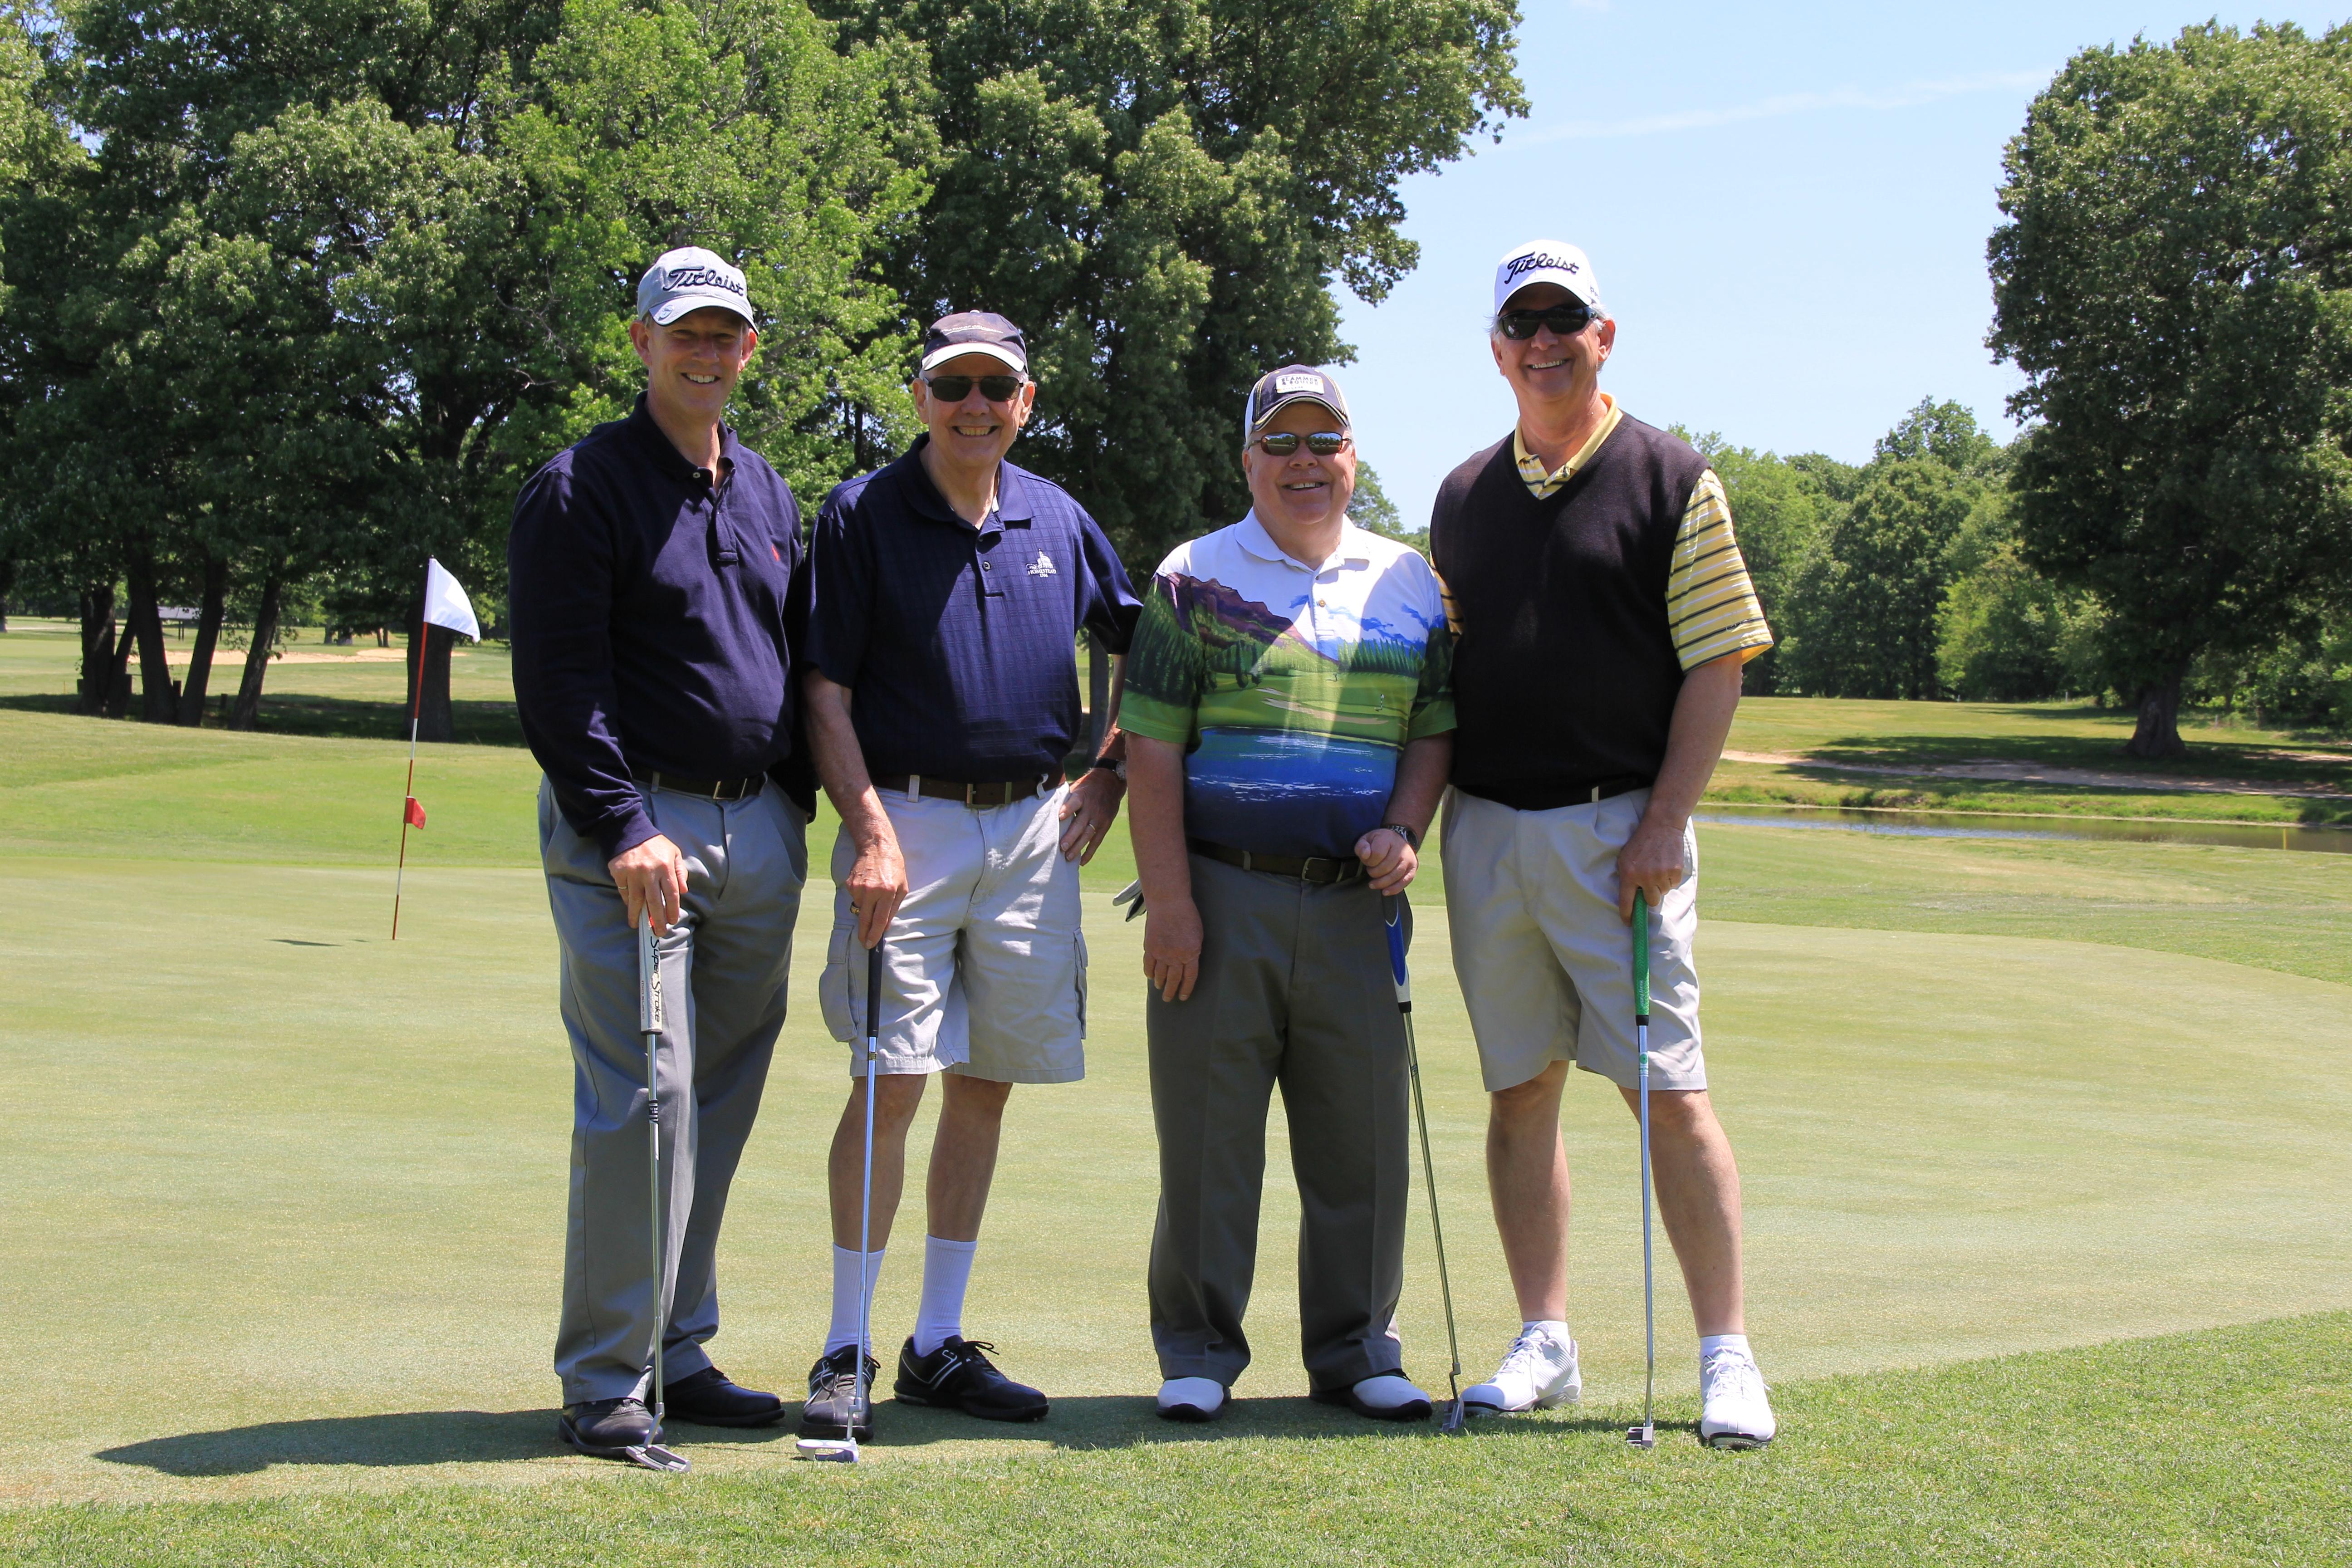 Team 5 - Dick Asbell, Rick Falkenstein, Ken Jones, Rick Rives